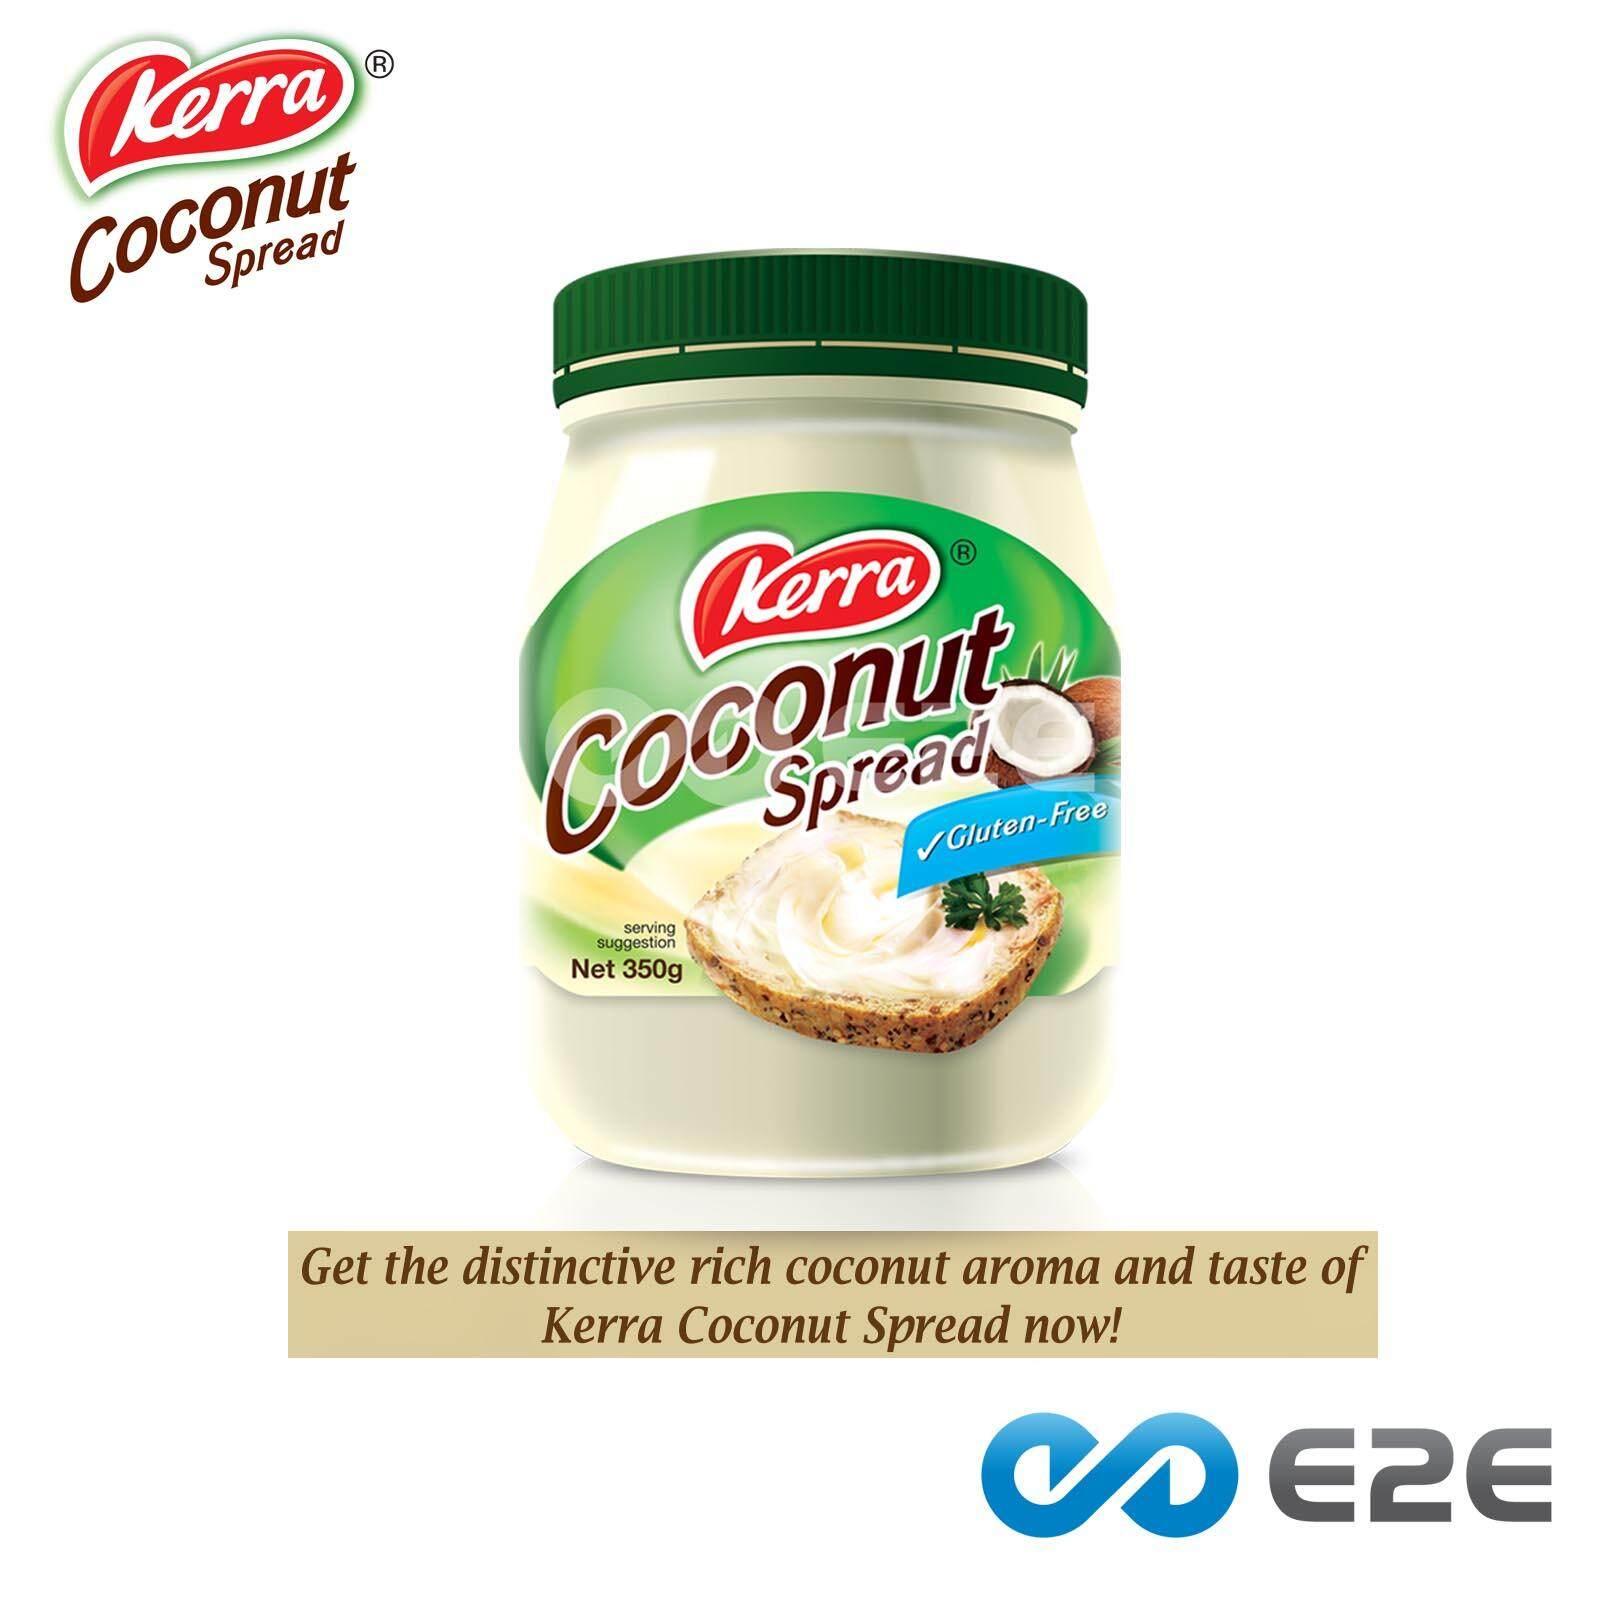 Fitur Goldenfil Selai Stoberi Xx Pr Strawberry Jam 1 Kg Spread Kerra Coconut 350g X Unit